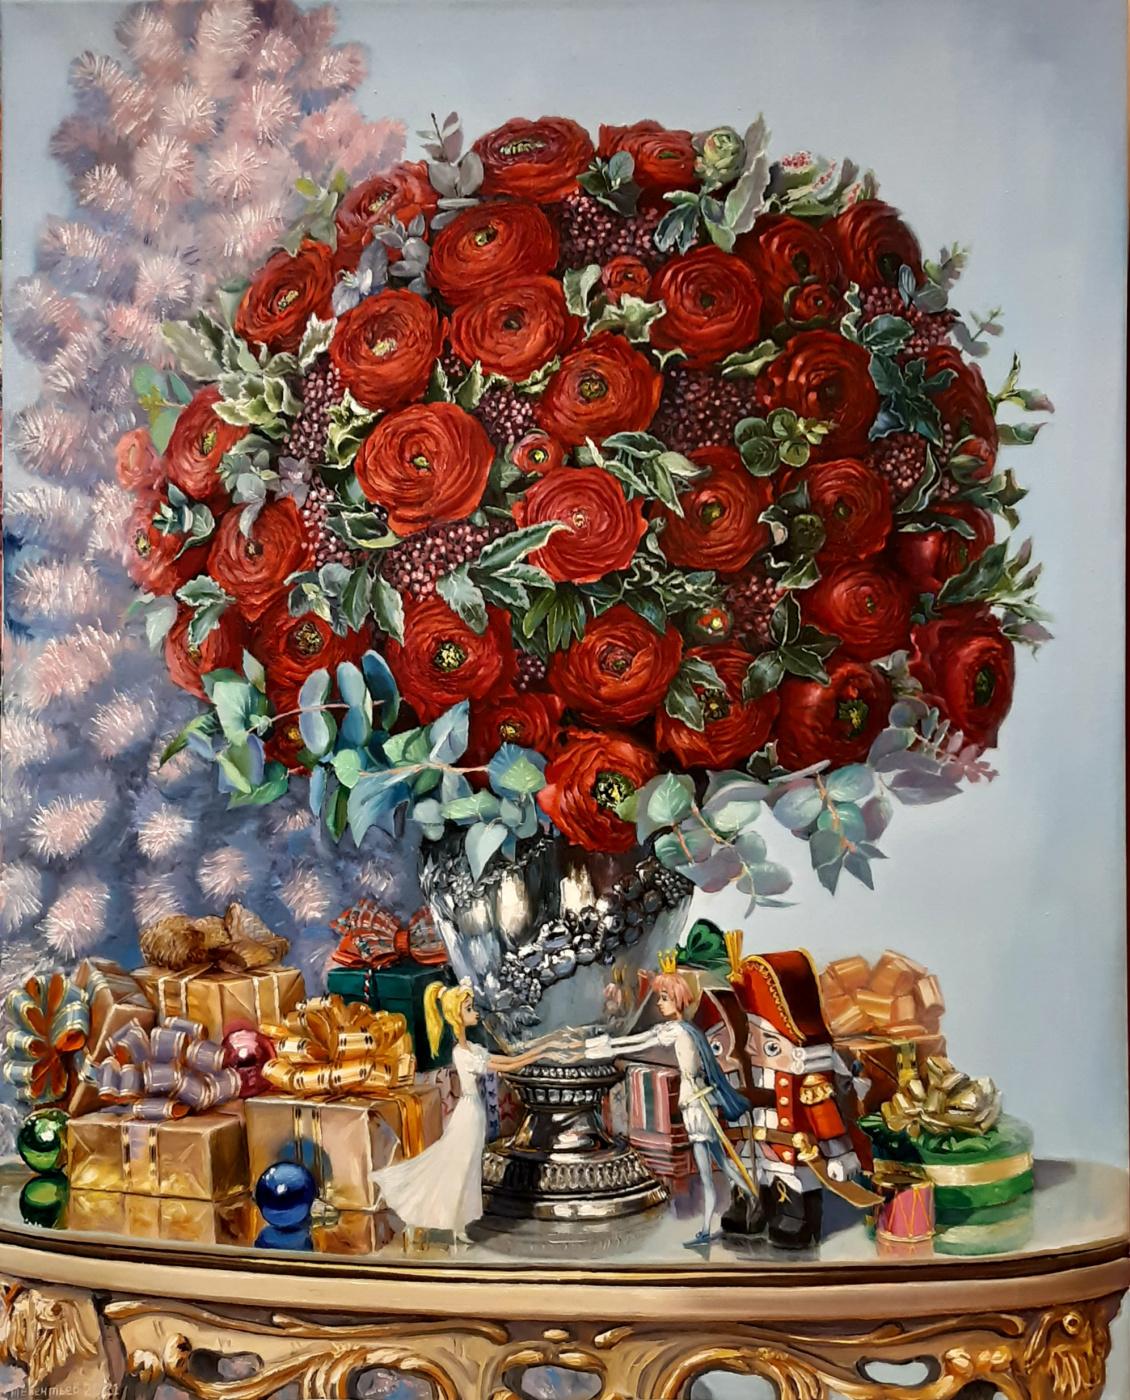 Evgeny Vladimirovich Terentyev. Fabulous bouquet 2.